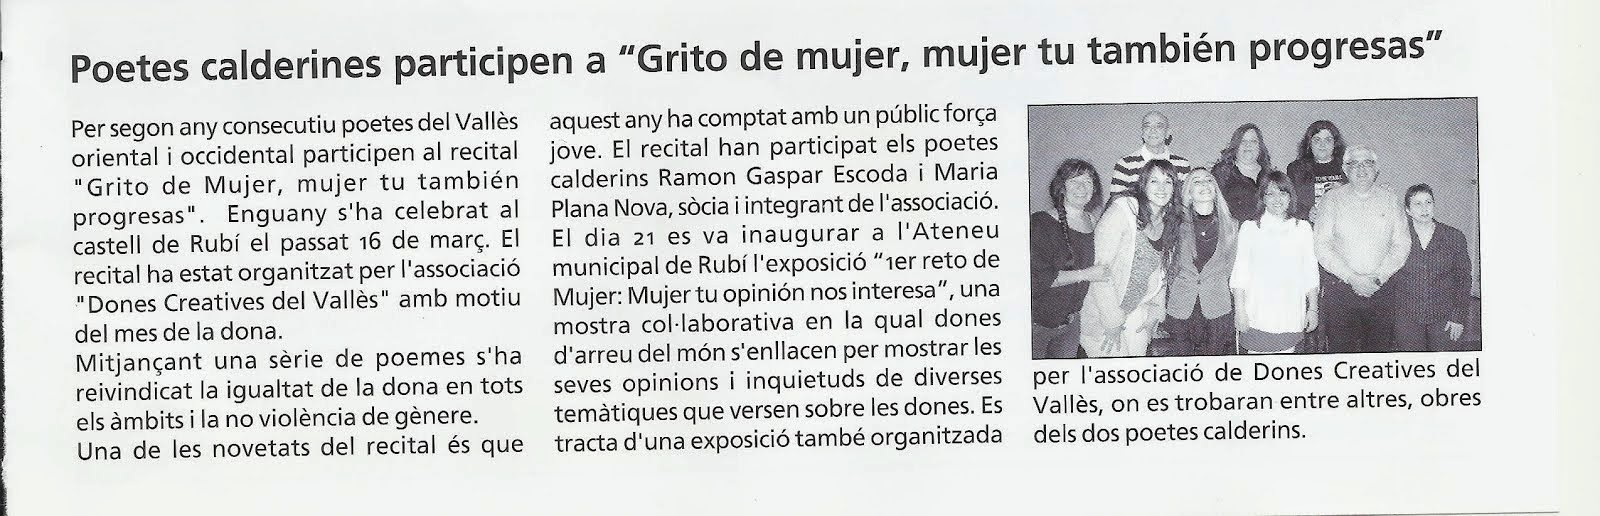 Noticia en la Revista Tot Caldes de Montbui